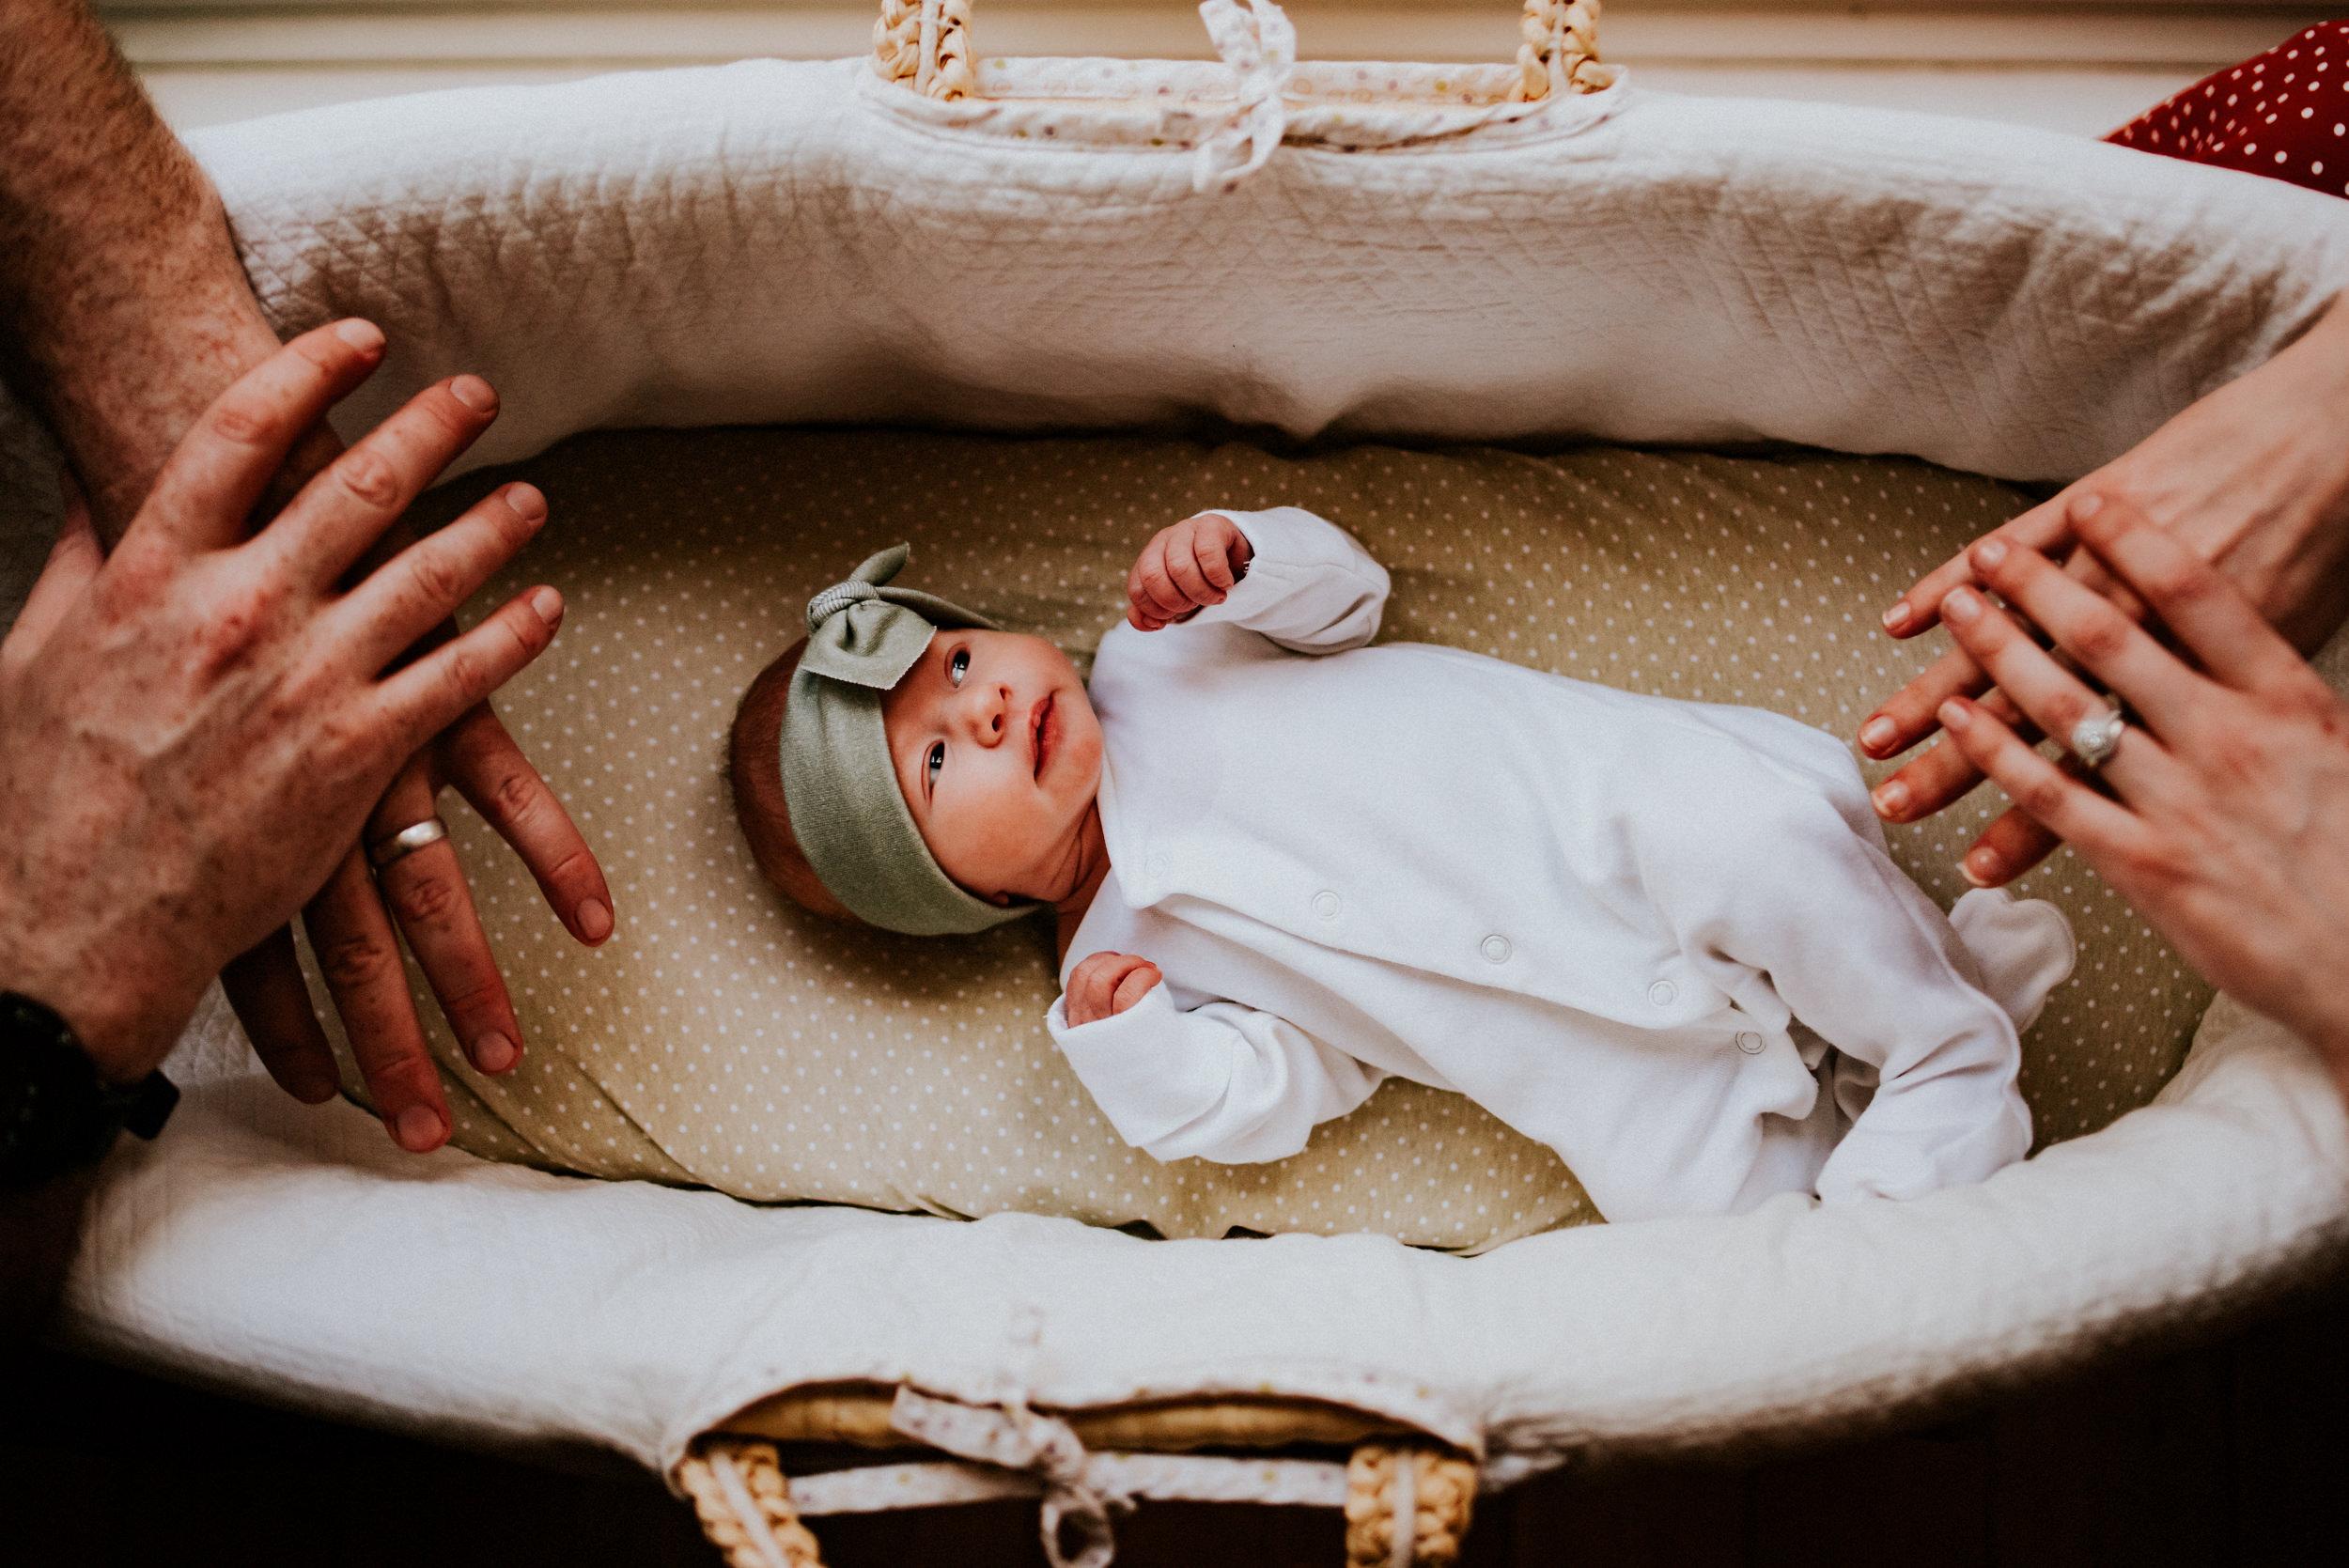 Castleford-Leeds-Newborn-Photographer-Family-Home-Shoot-Shutter-Go-Click-41.jpg